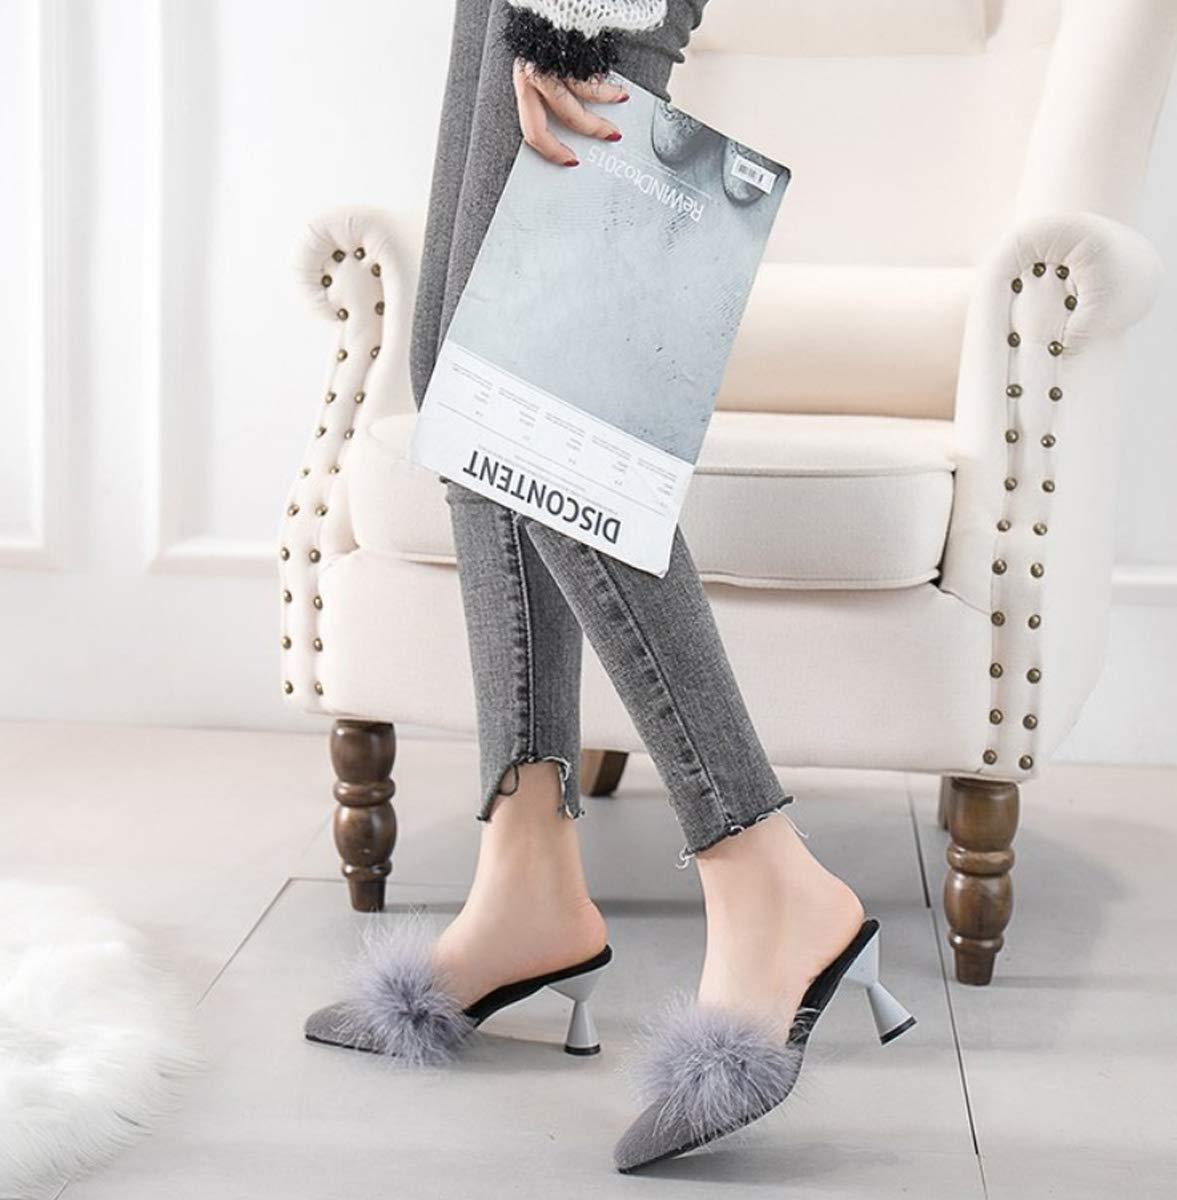 DANDANJIE Damenpücher Faux Plush Casual Casual Casual Slip-Ons & Loafers Mit High Heel Pointed Toe Flip-Flops Schuhe Für Fall Winter Outdoor 6d0124